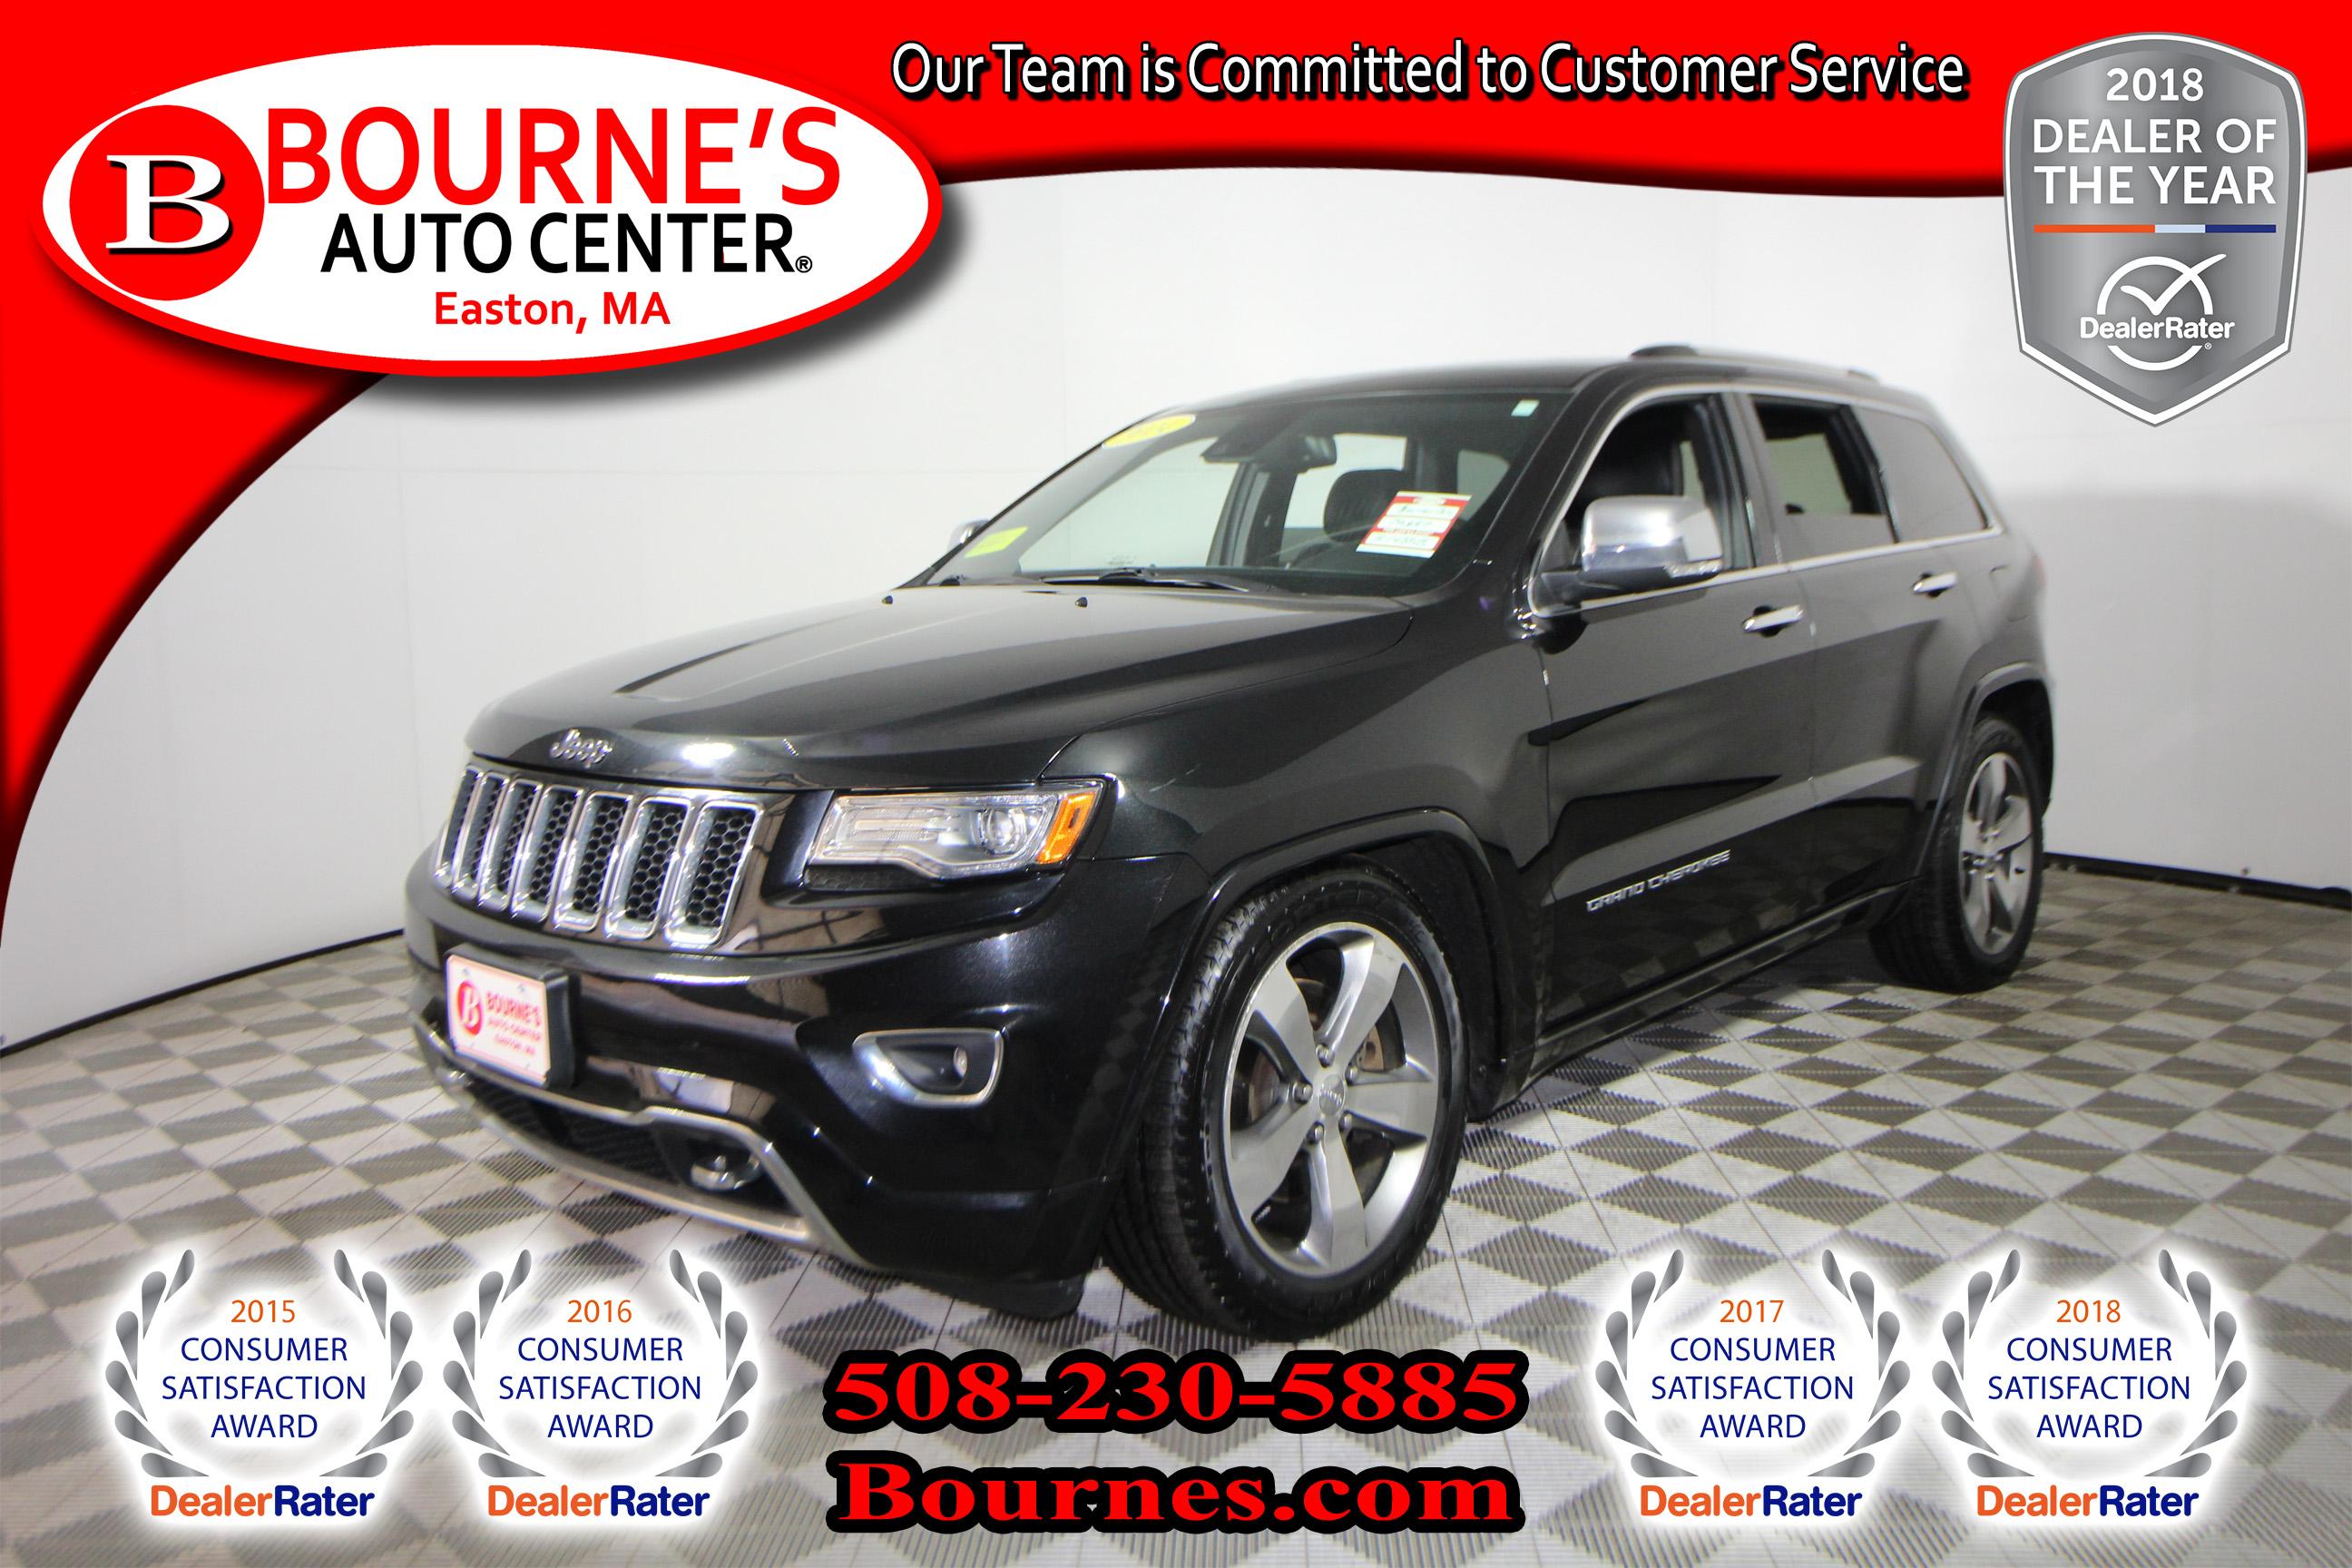 2014 Jeep Grand Cherokee Overland 4x4 w/ Navigation,Leather,Sunroof,Heated SUV